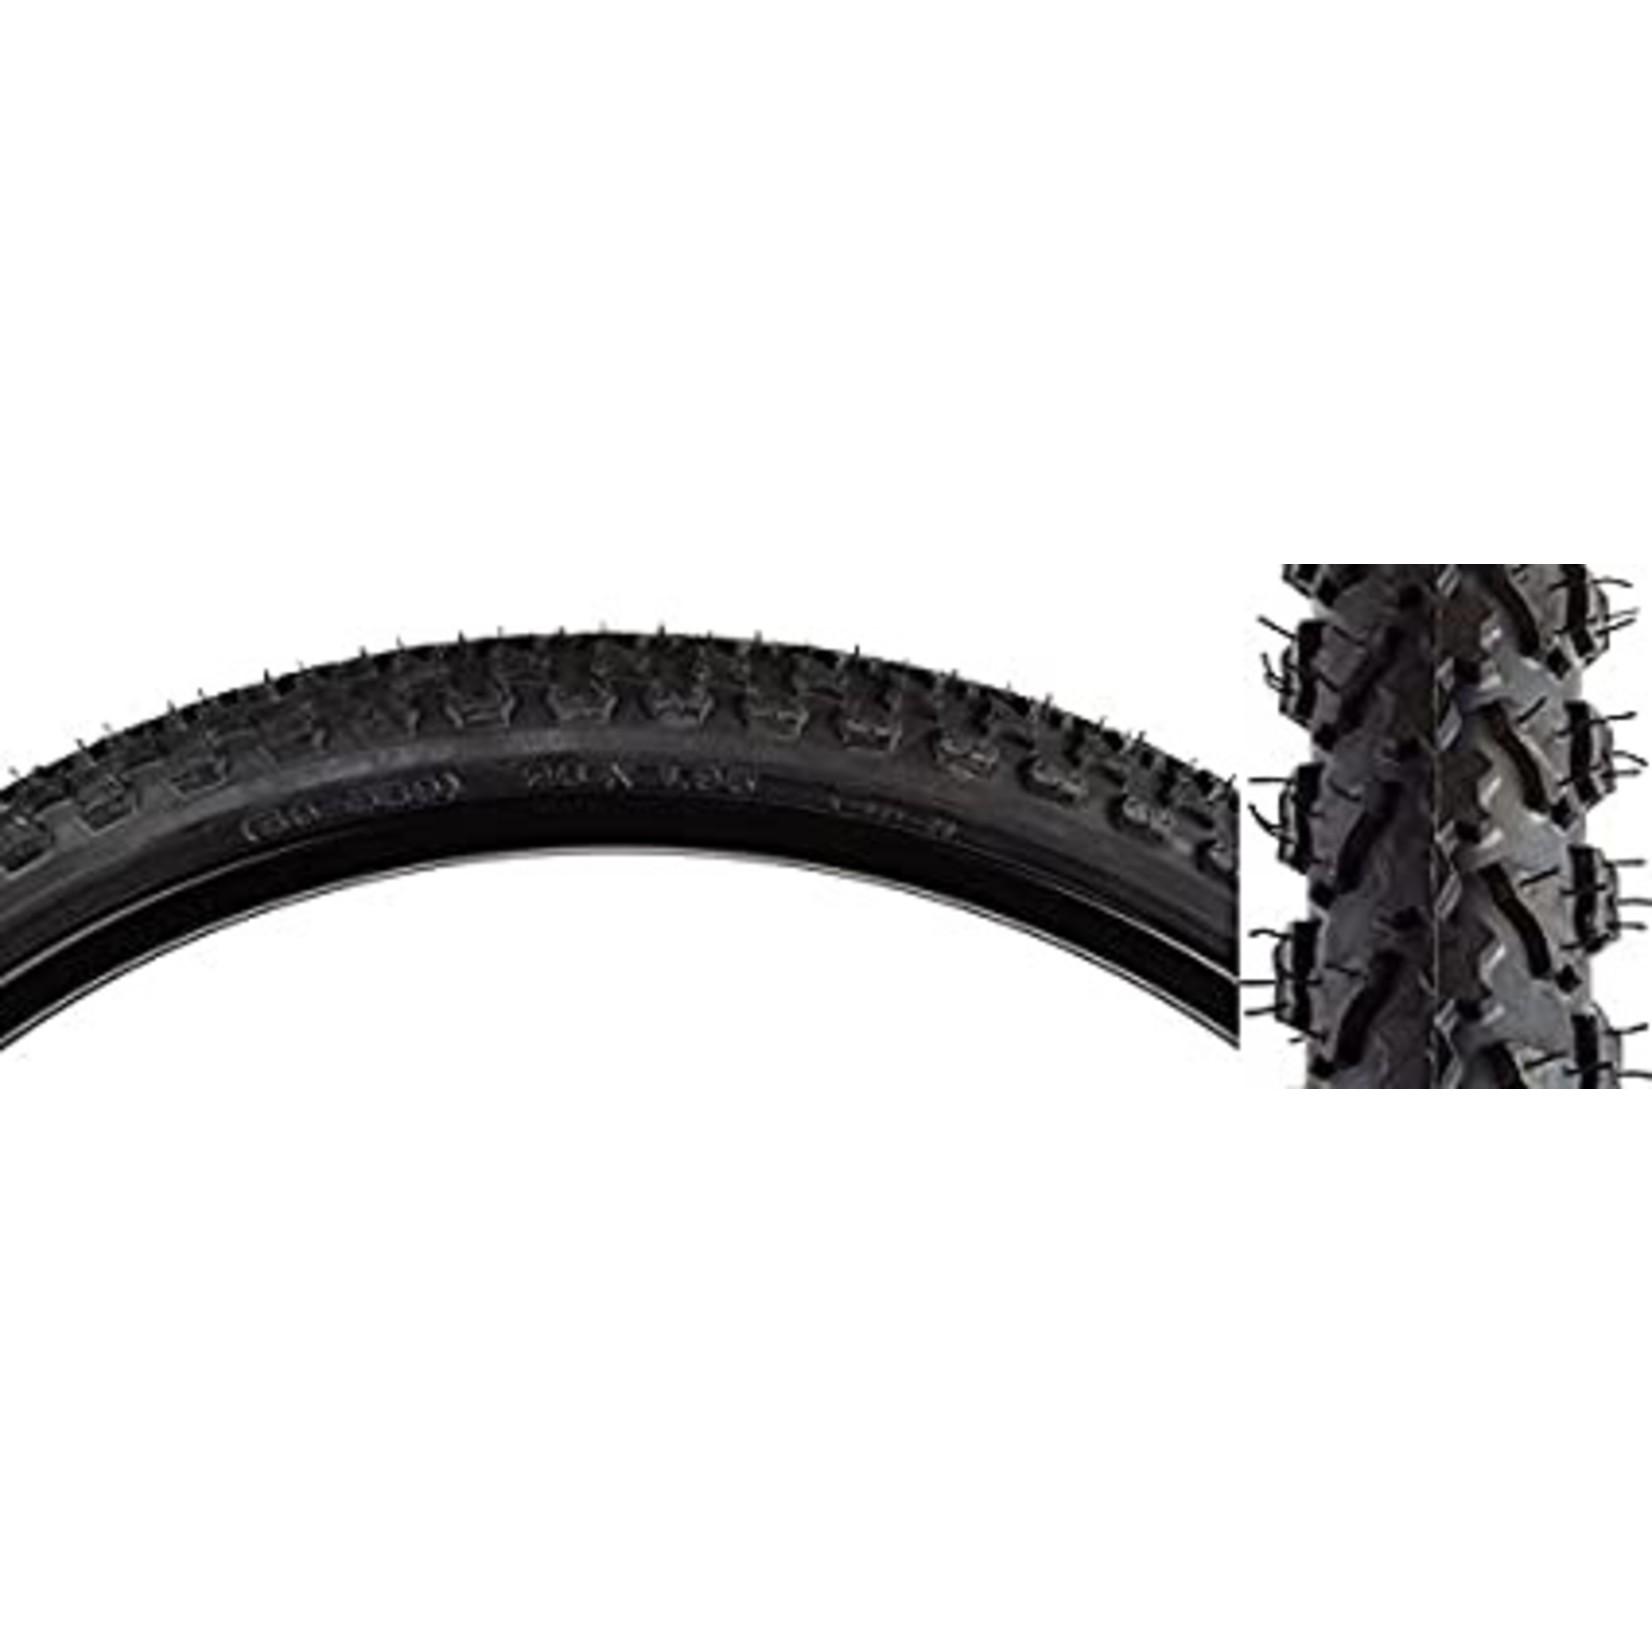 Kenda K821 Mod Quad 26x1.95 Wire Bead Tire